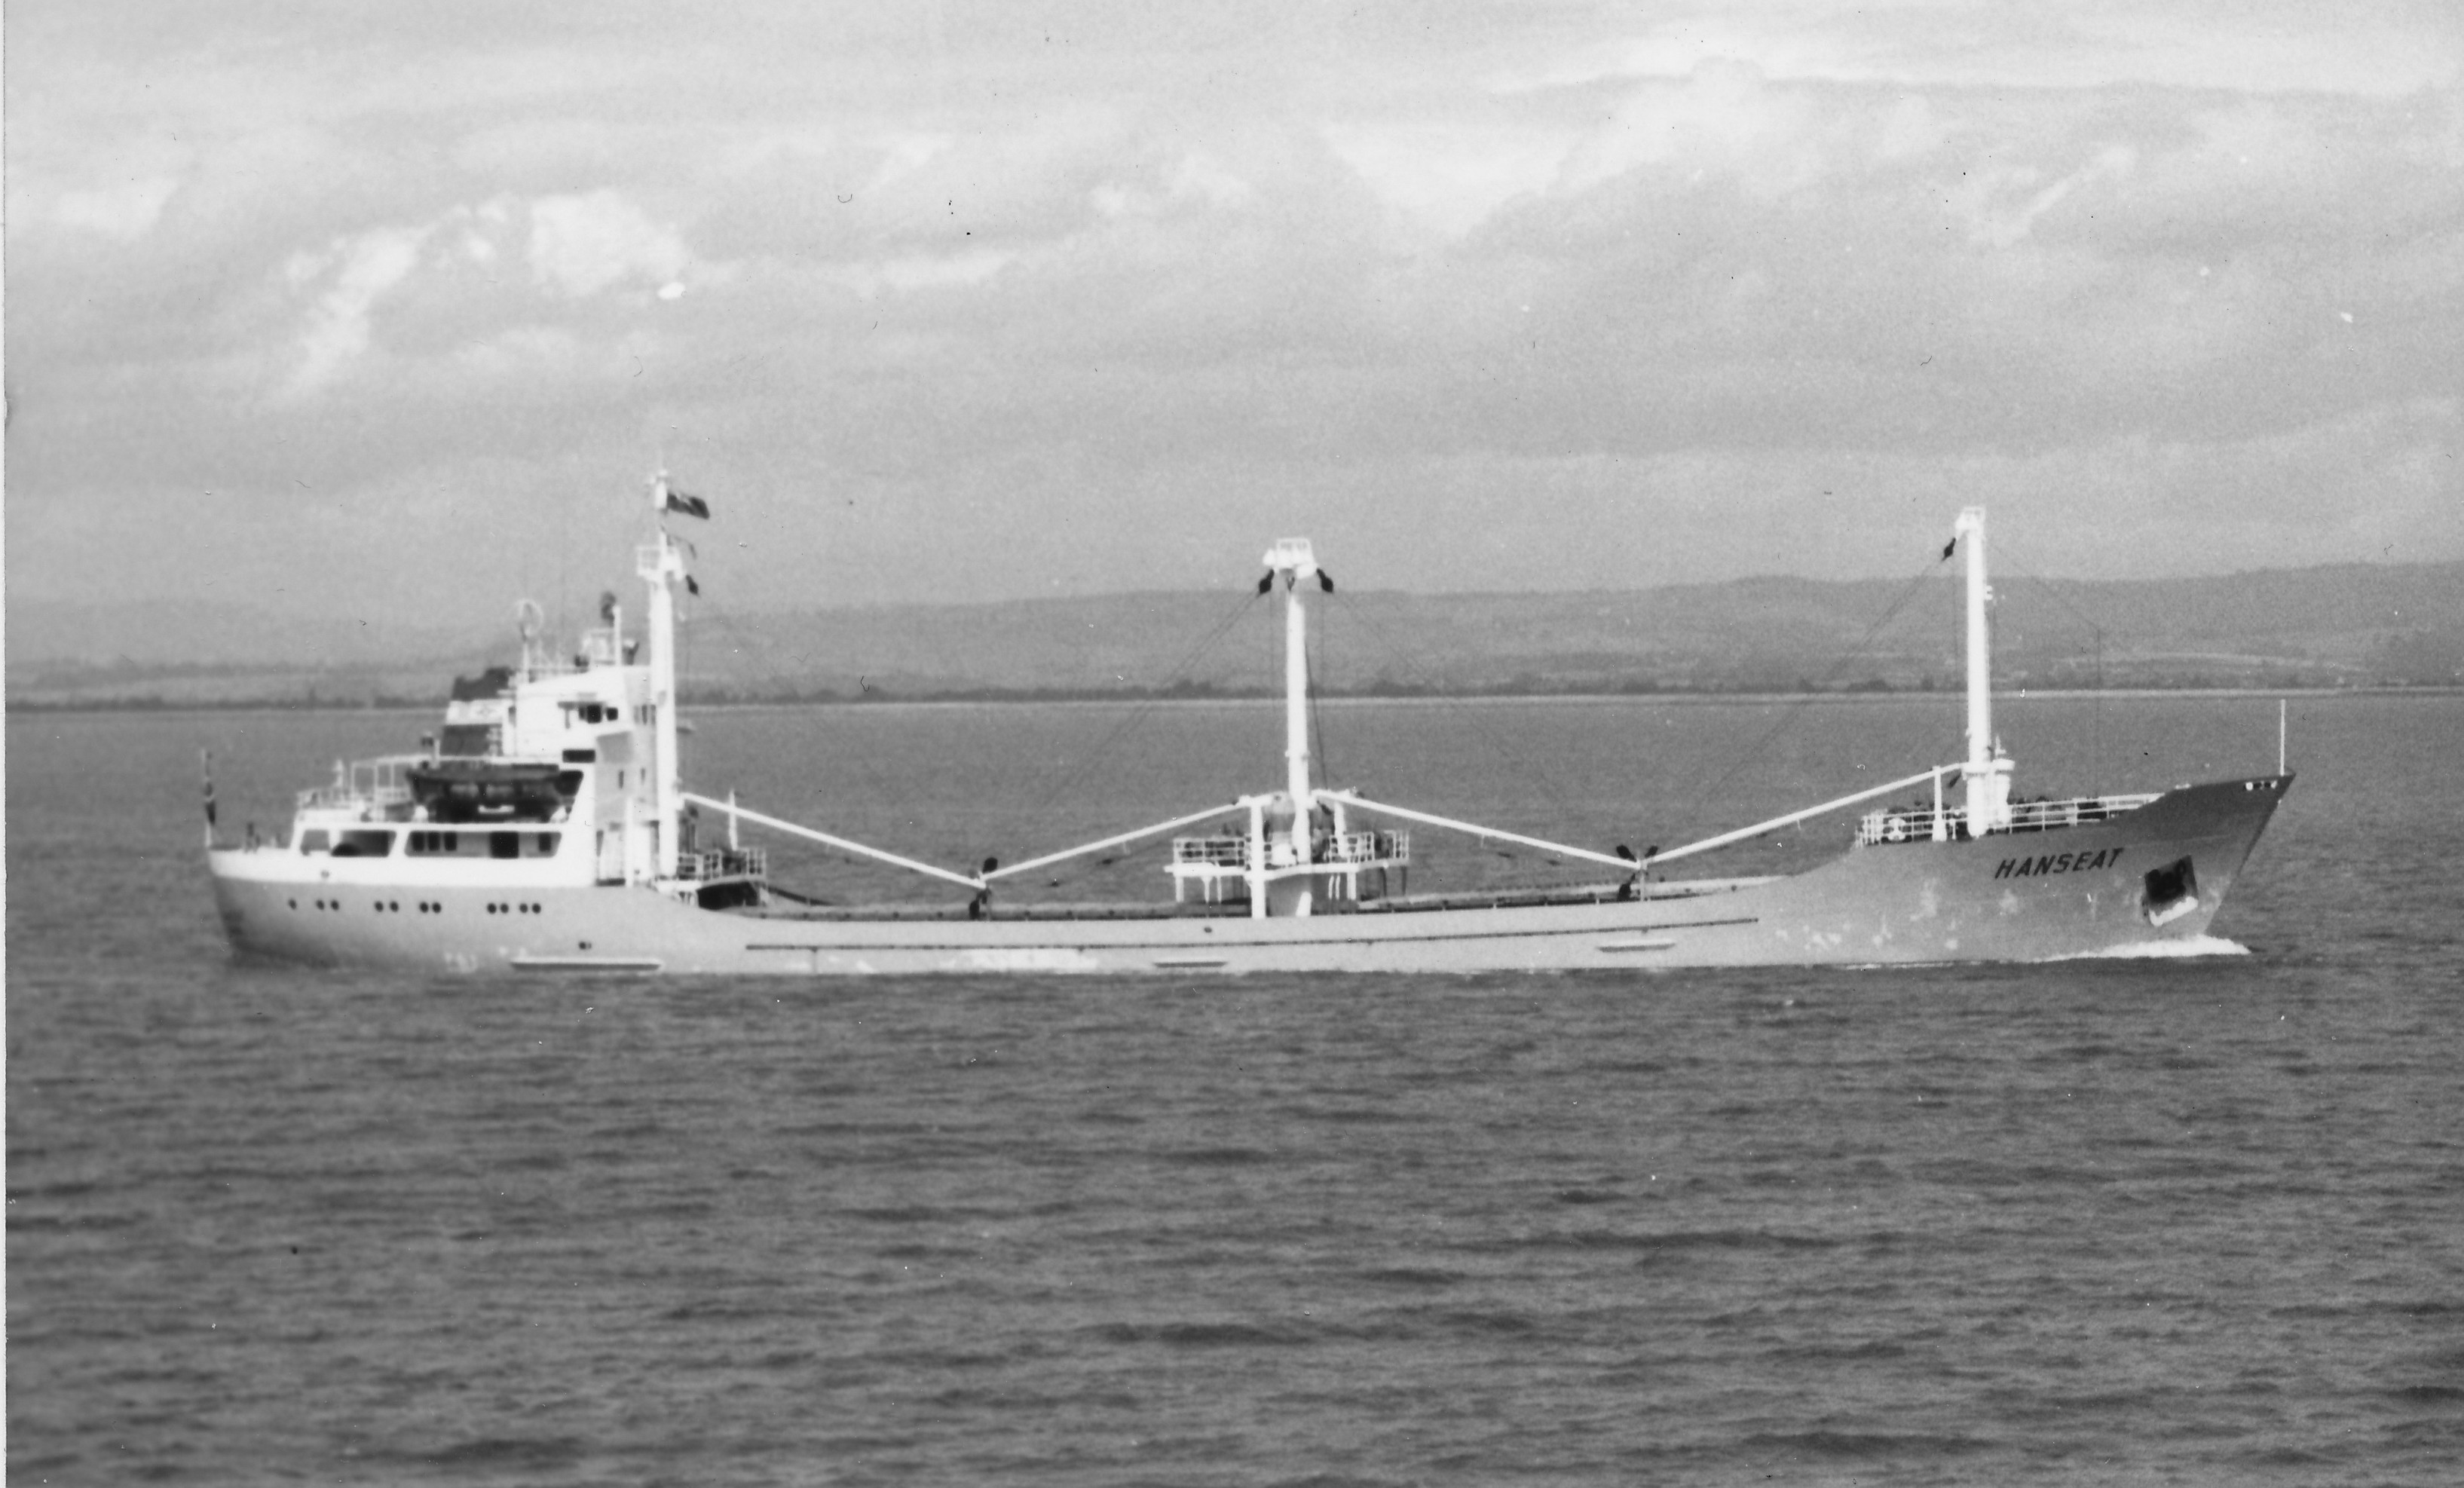 Hanseat (1965)